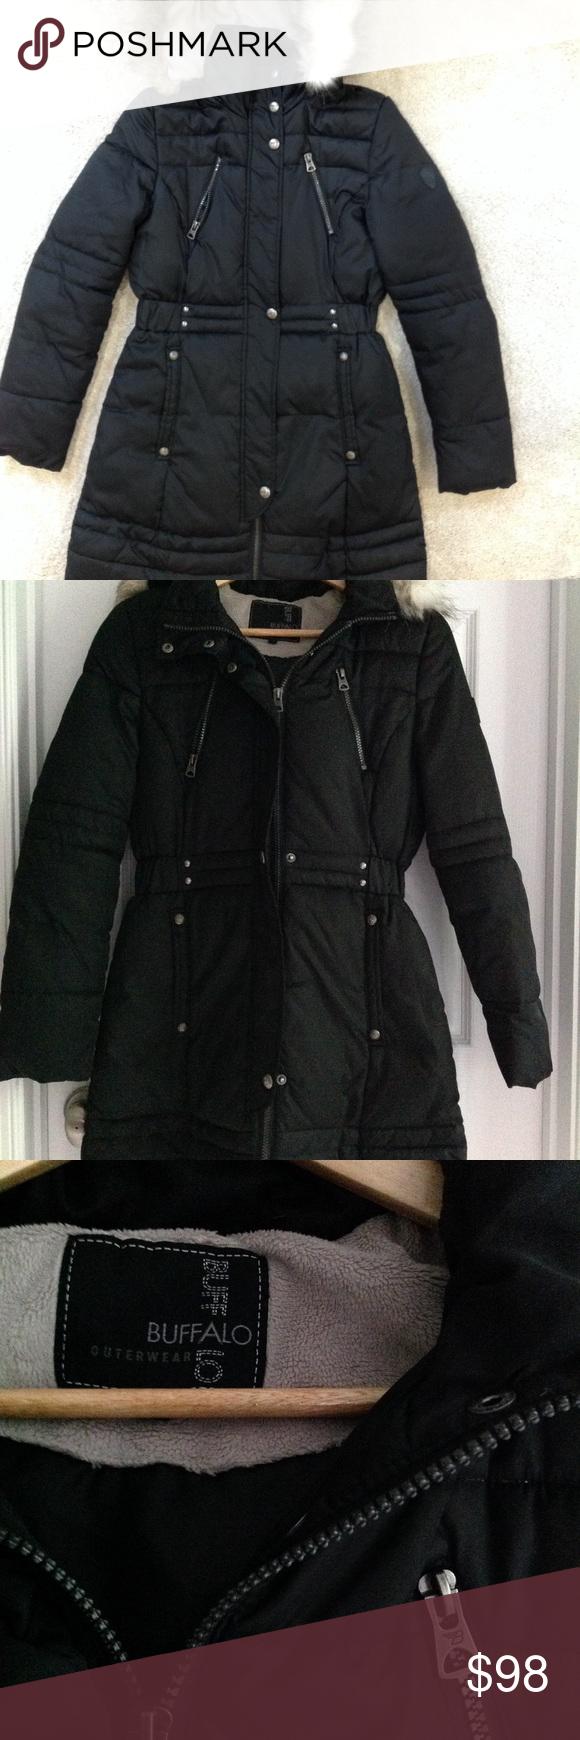 Buffalo David Bitton Women S Cinched Waist Parka In 2021 Coats Jackets Women Hooded Winter Coat Army Green Bomber Jacket [ 1740 x 580 Pixel ]